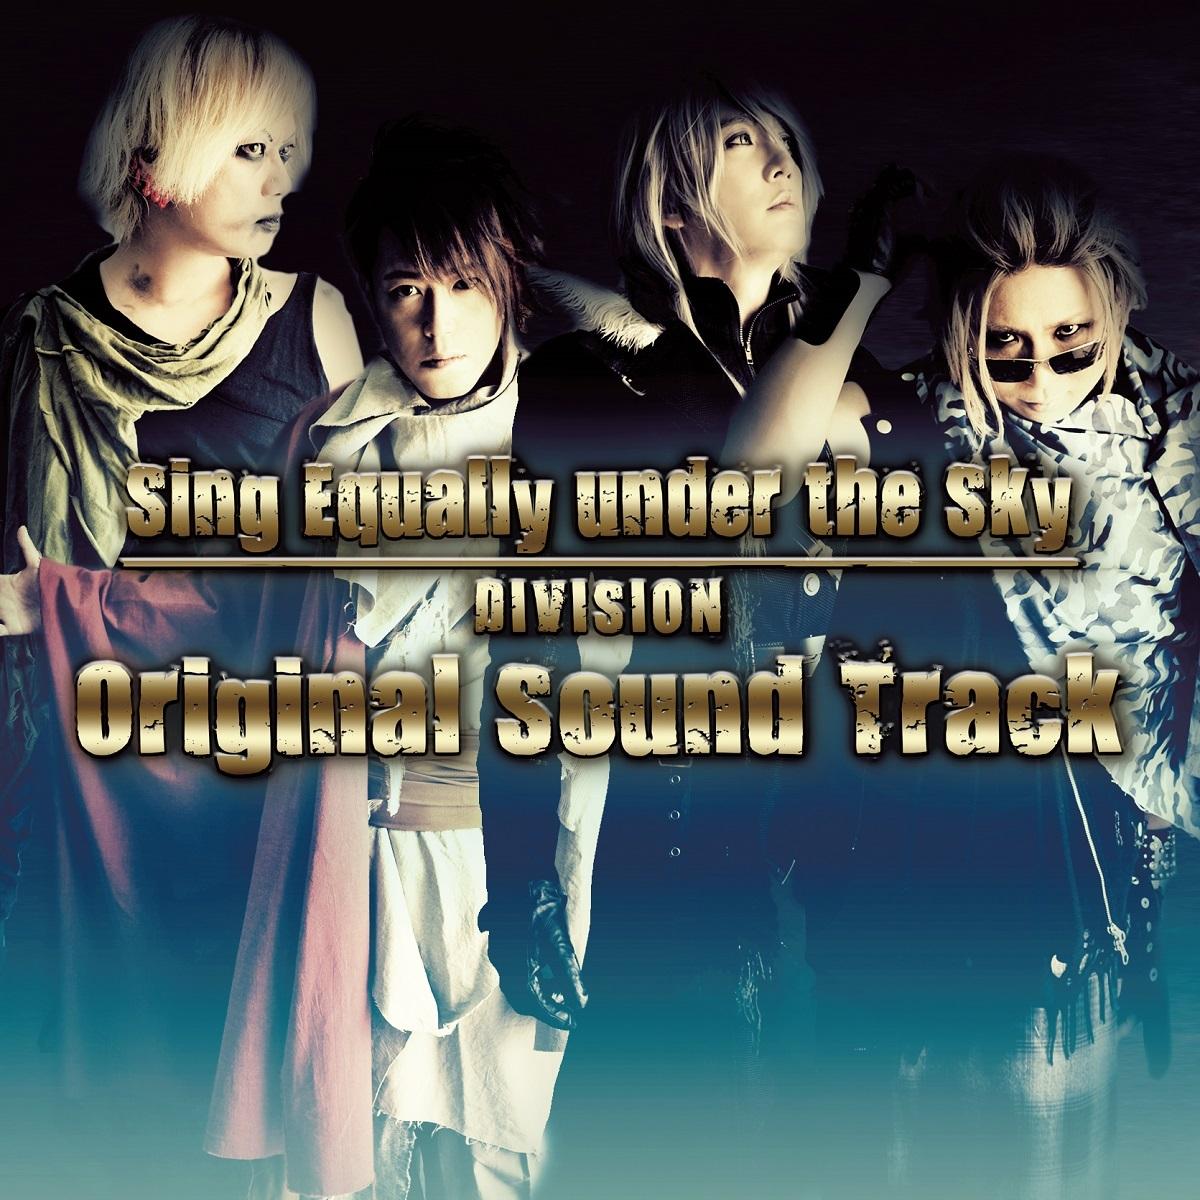 『Sing Equally under the Sky ~DIVISION~  Original Sound Track』